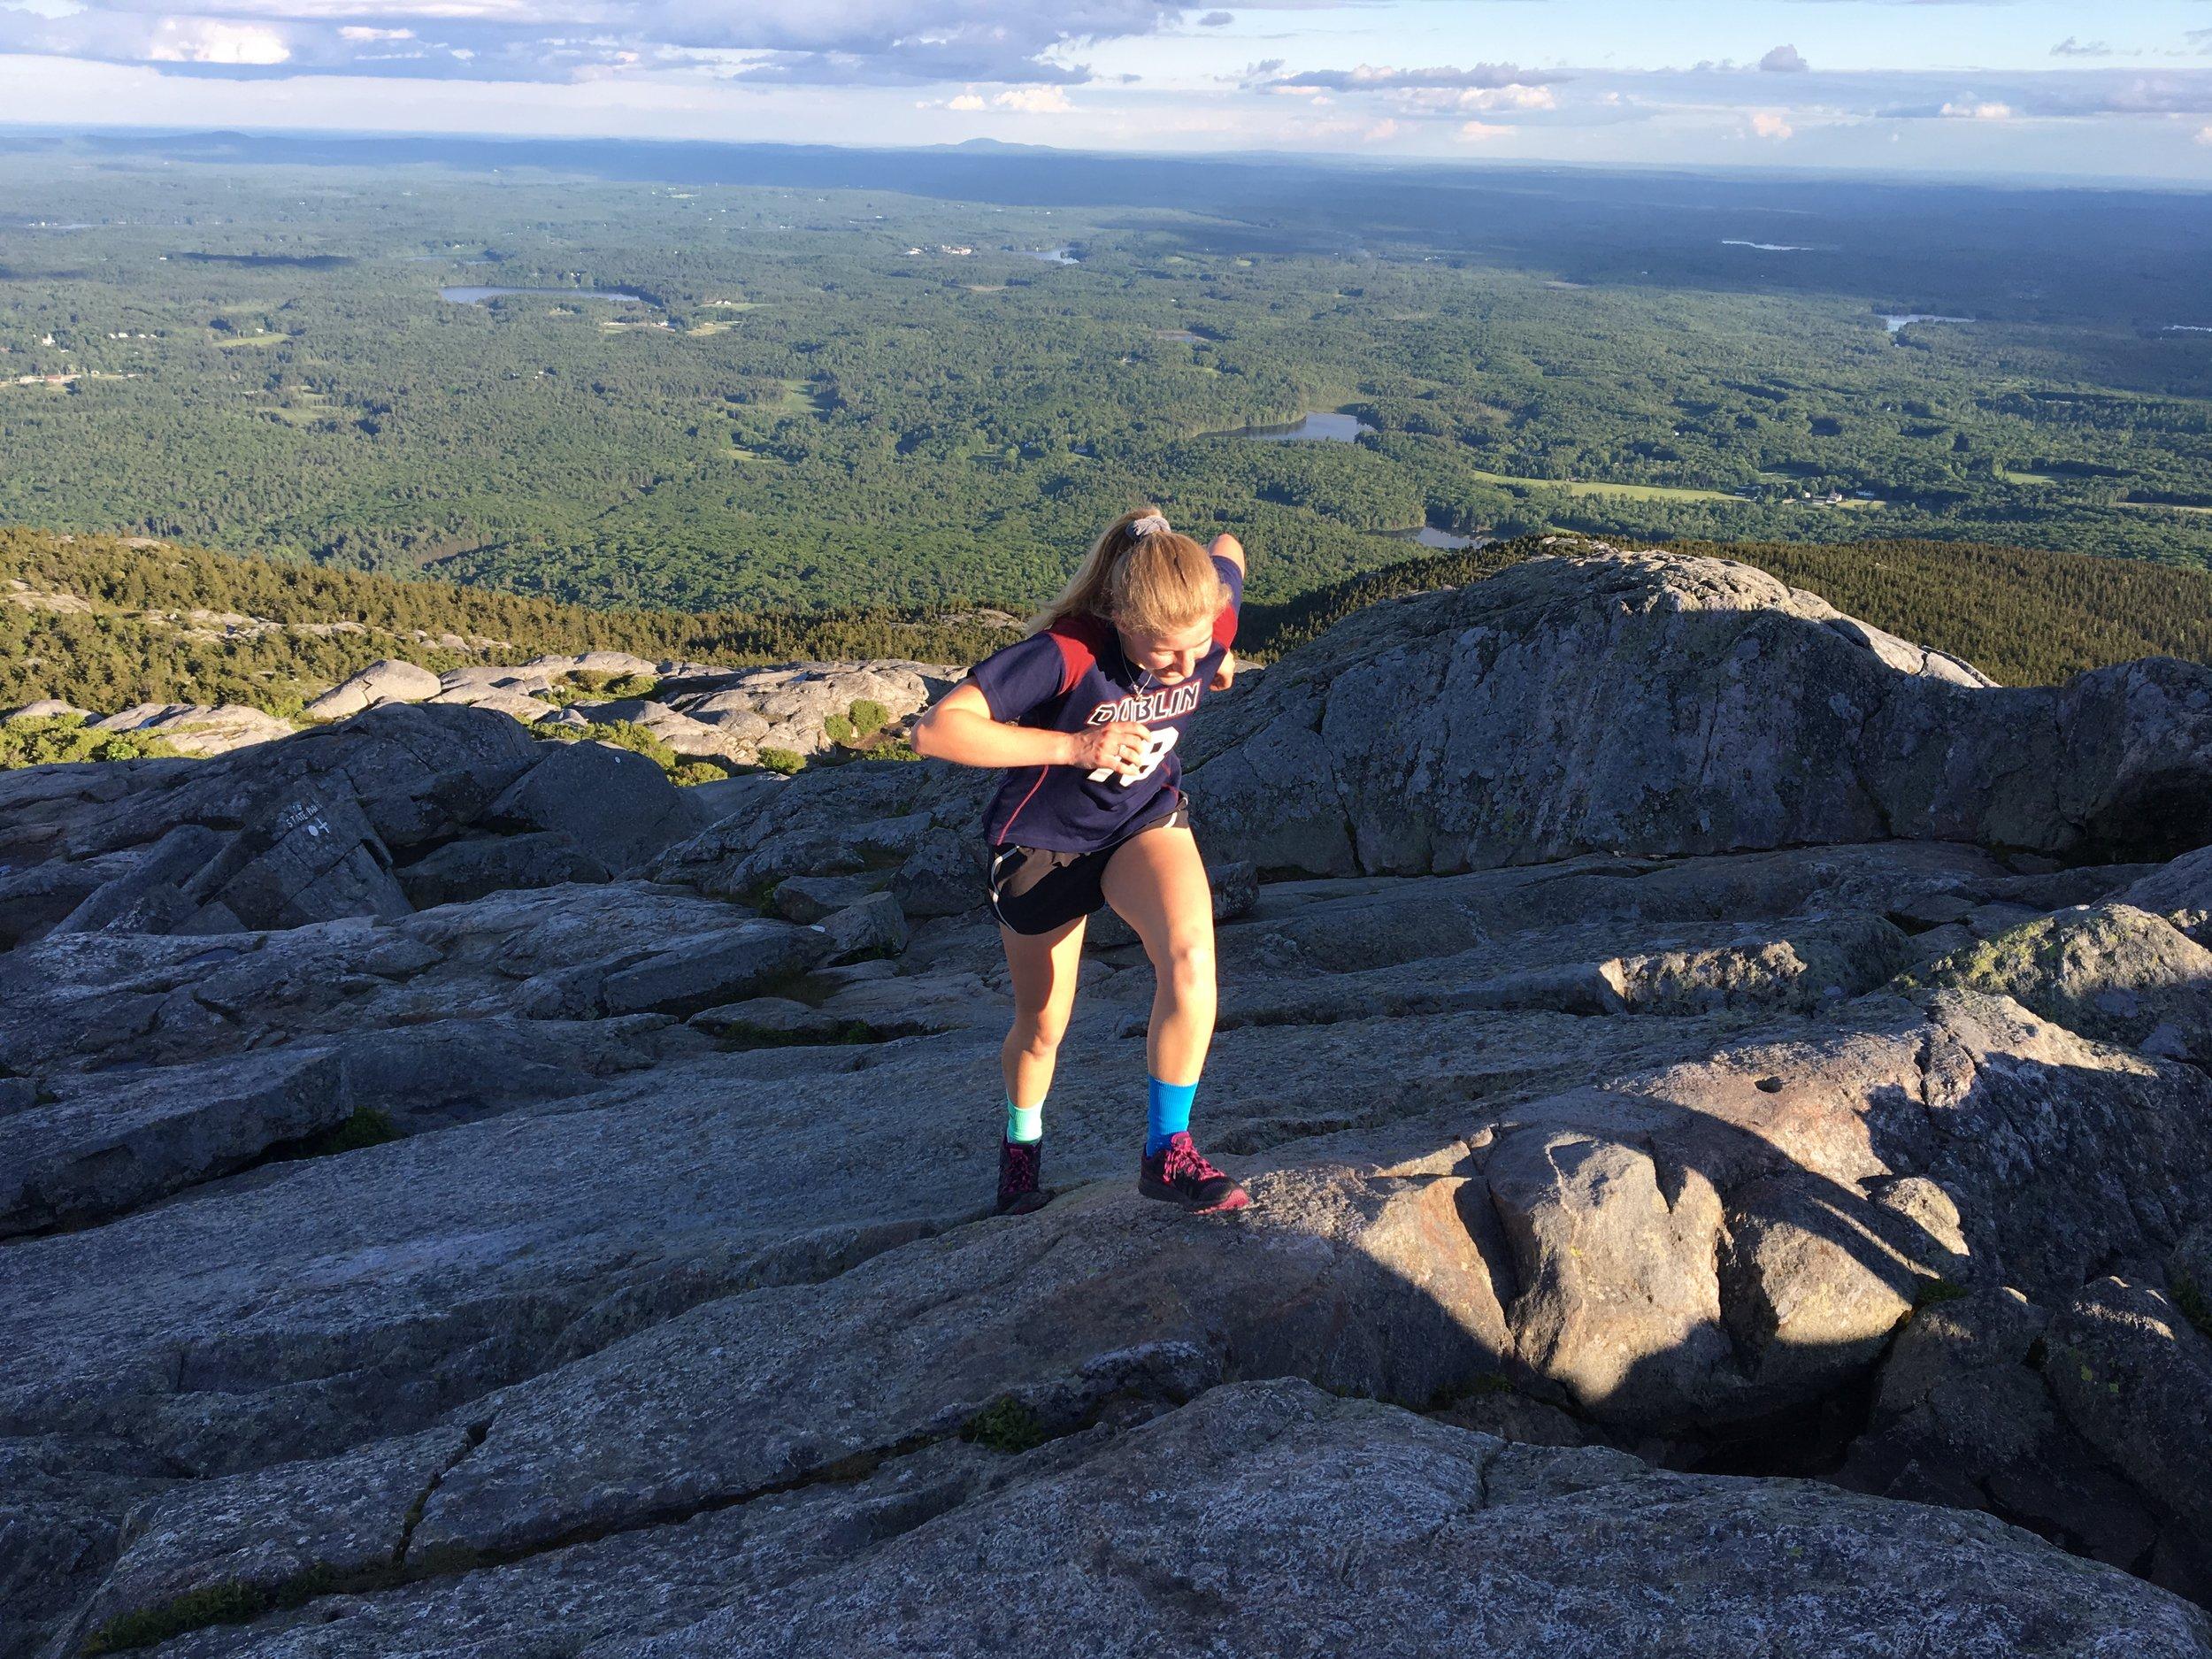 Aggie reaching the summit.